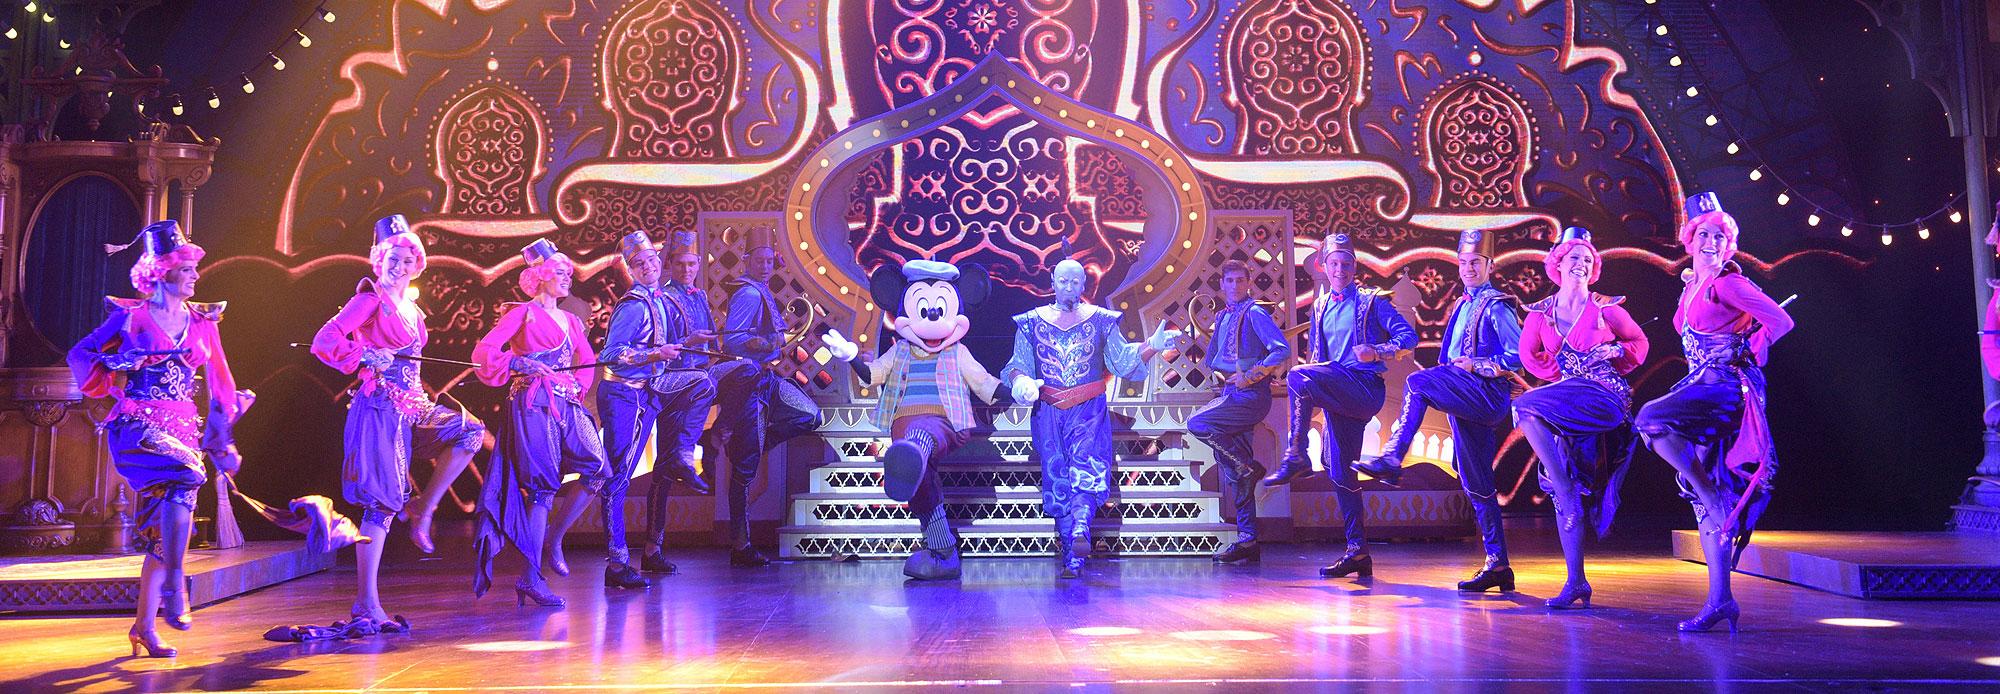 Extra Magic Time - Disneyland Parks